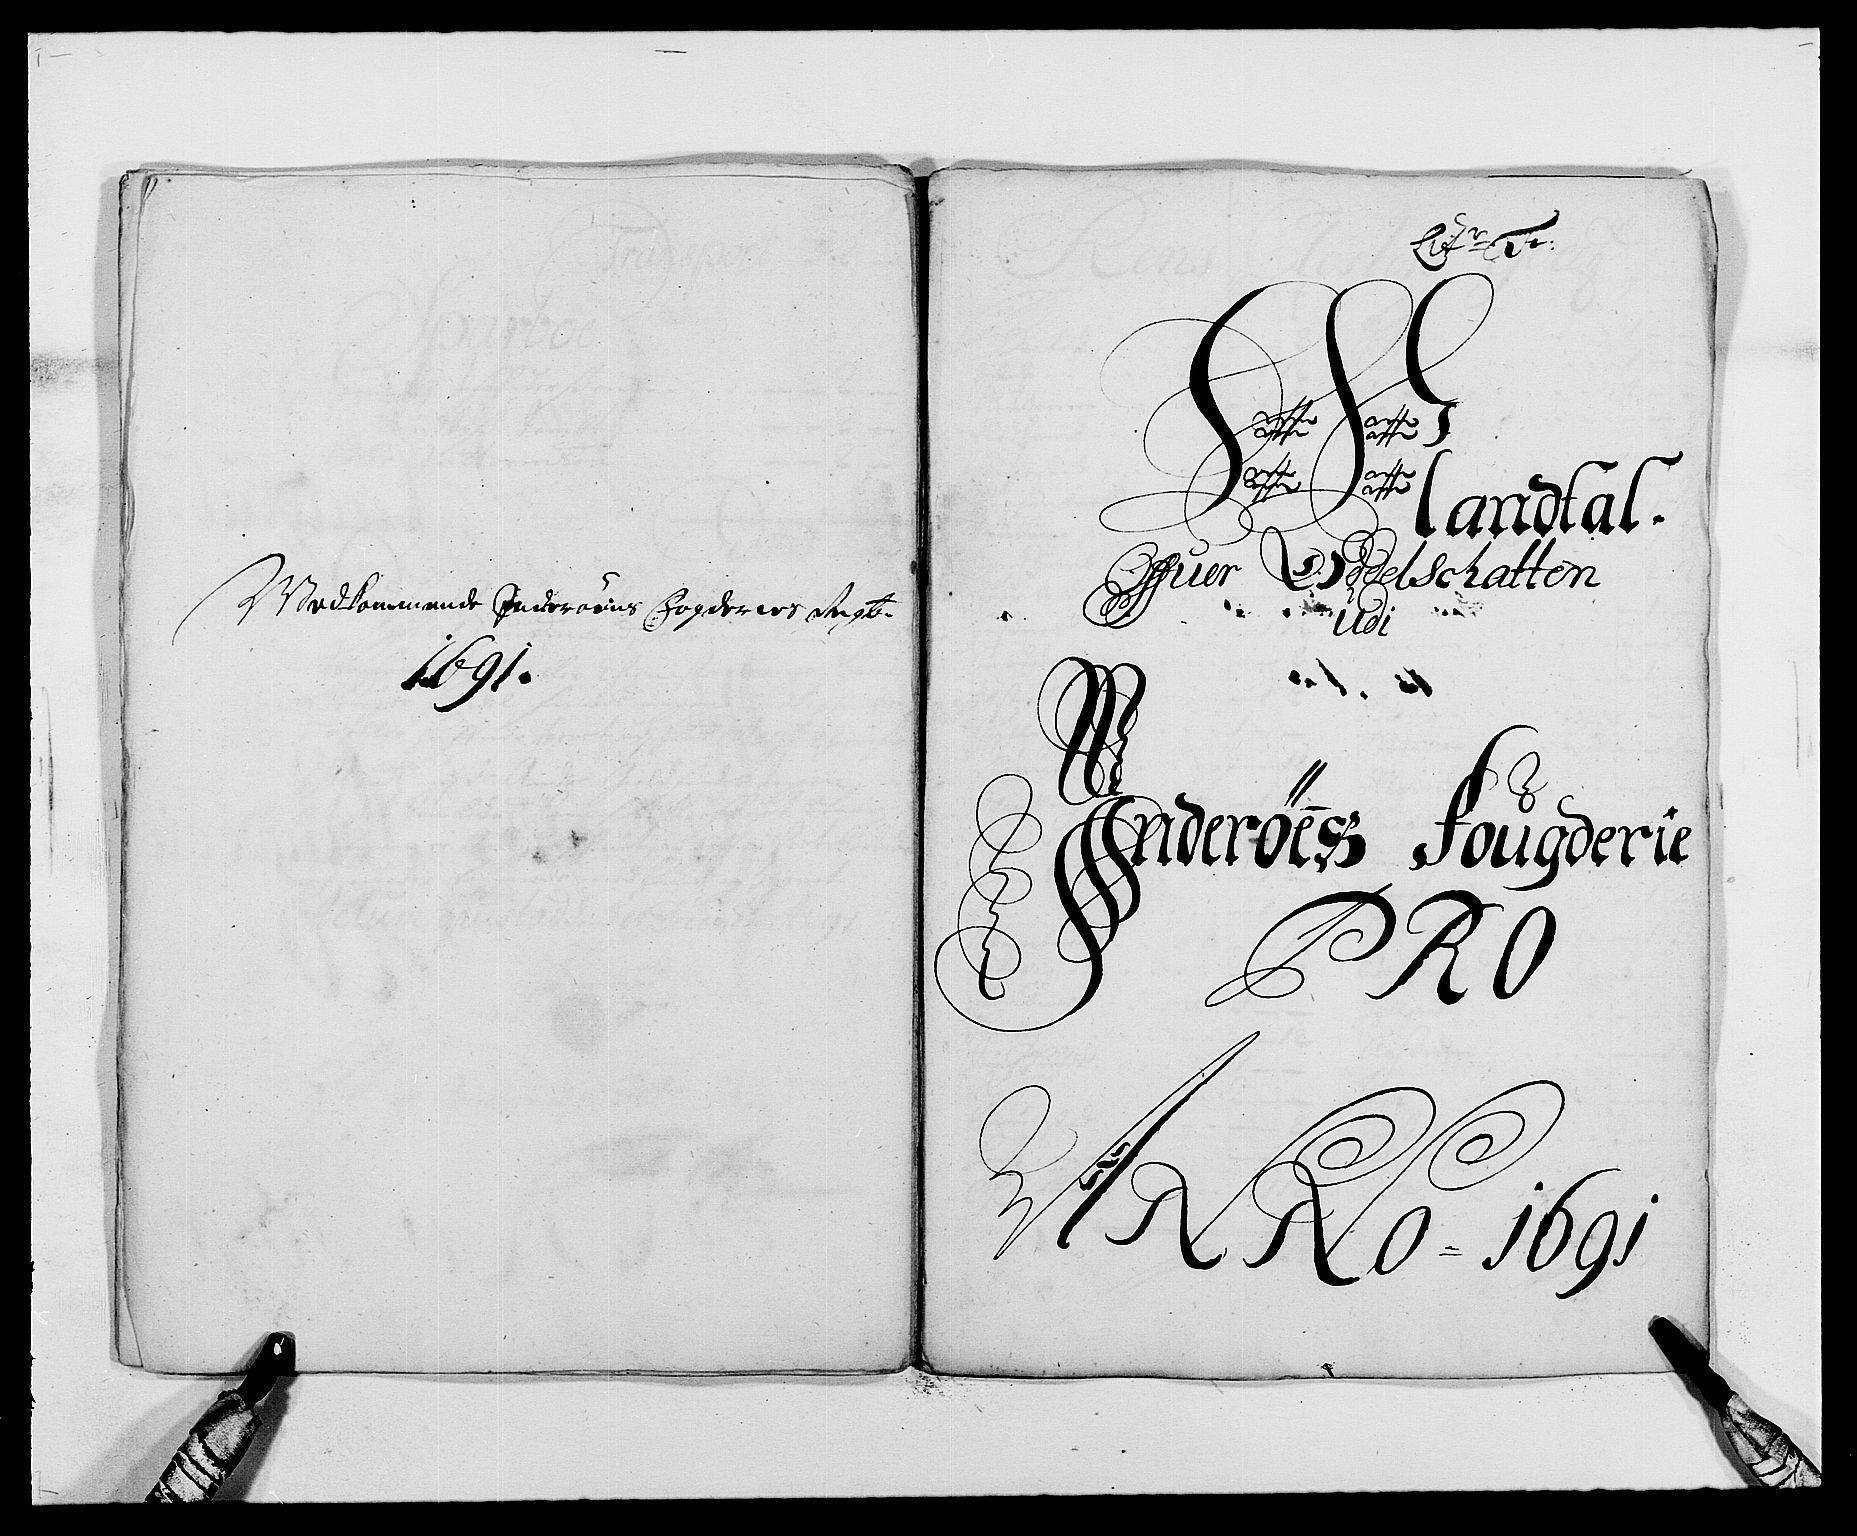 RA, Rentekammeret inntil 1814, Reviderte regnskaper, Fogderegnskap, R63/L4307: Fogderegnskap Inderøy, 1690-1691, s. 304